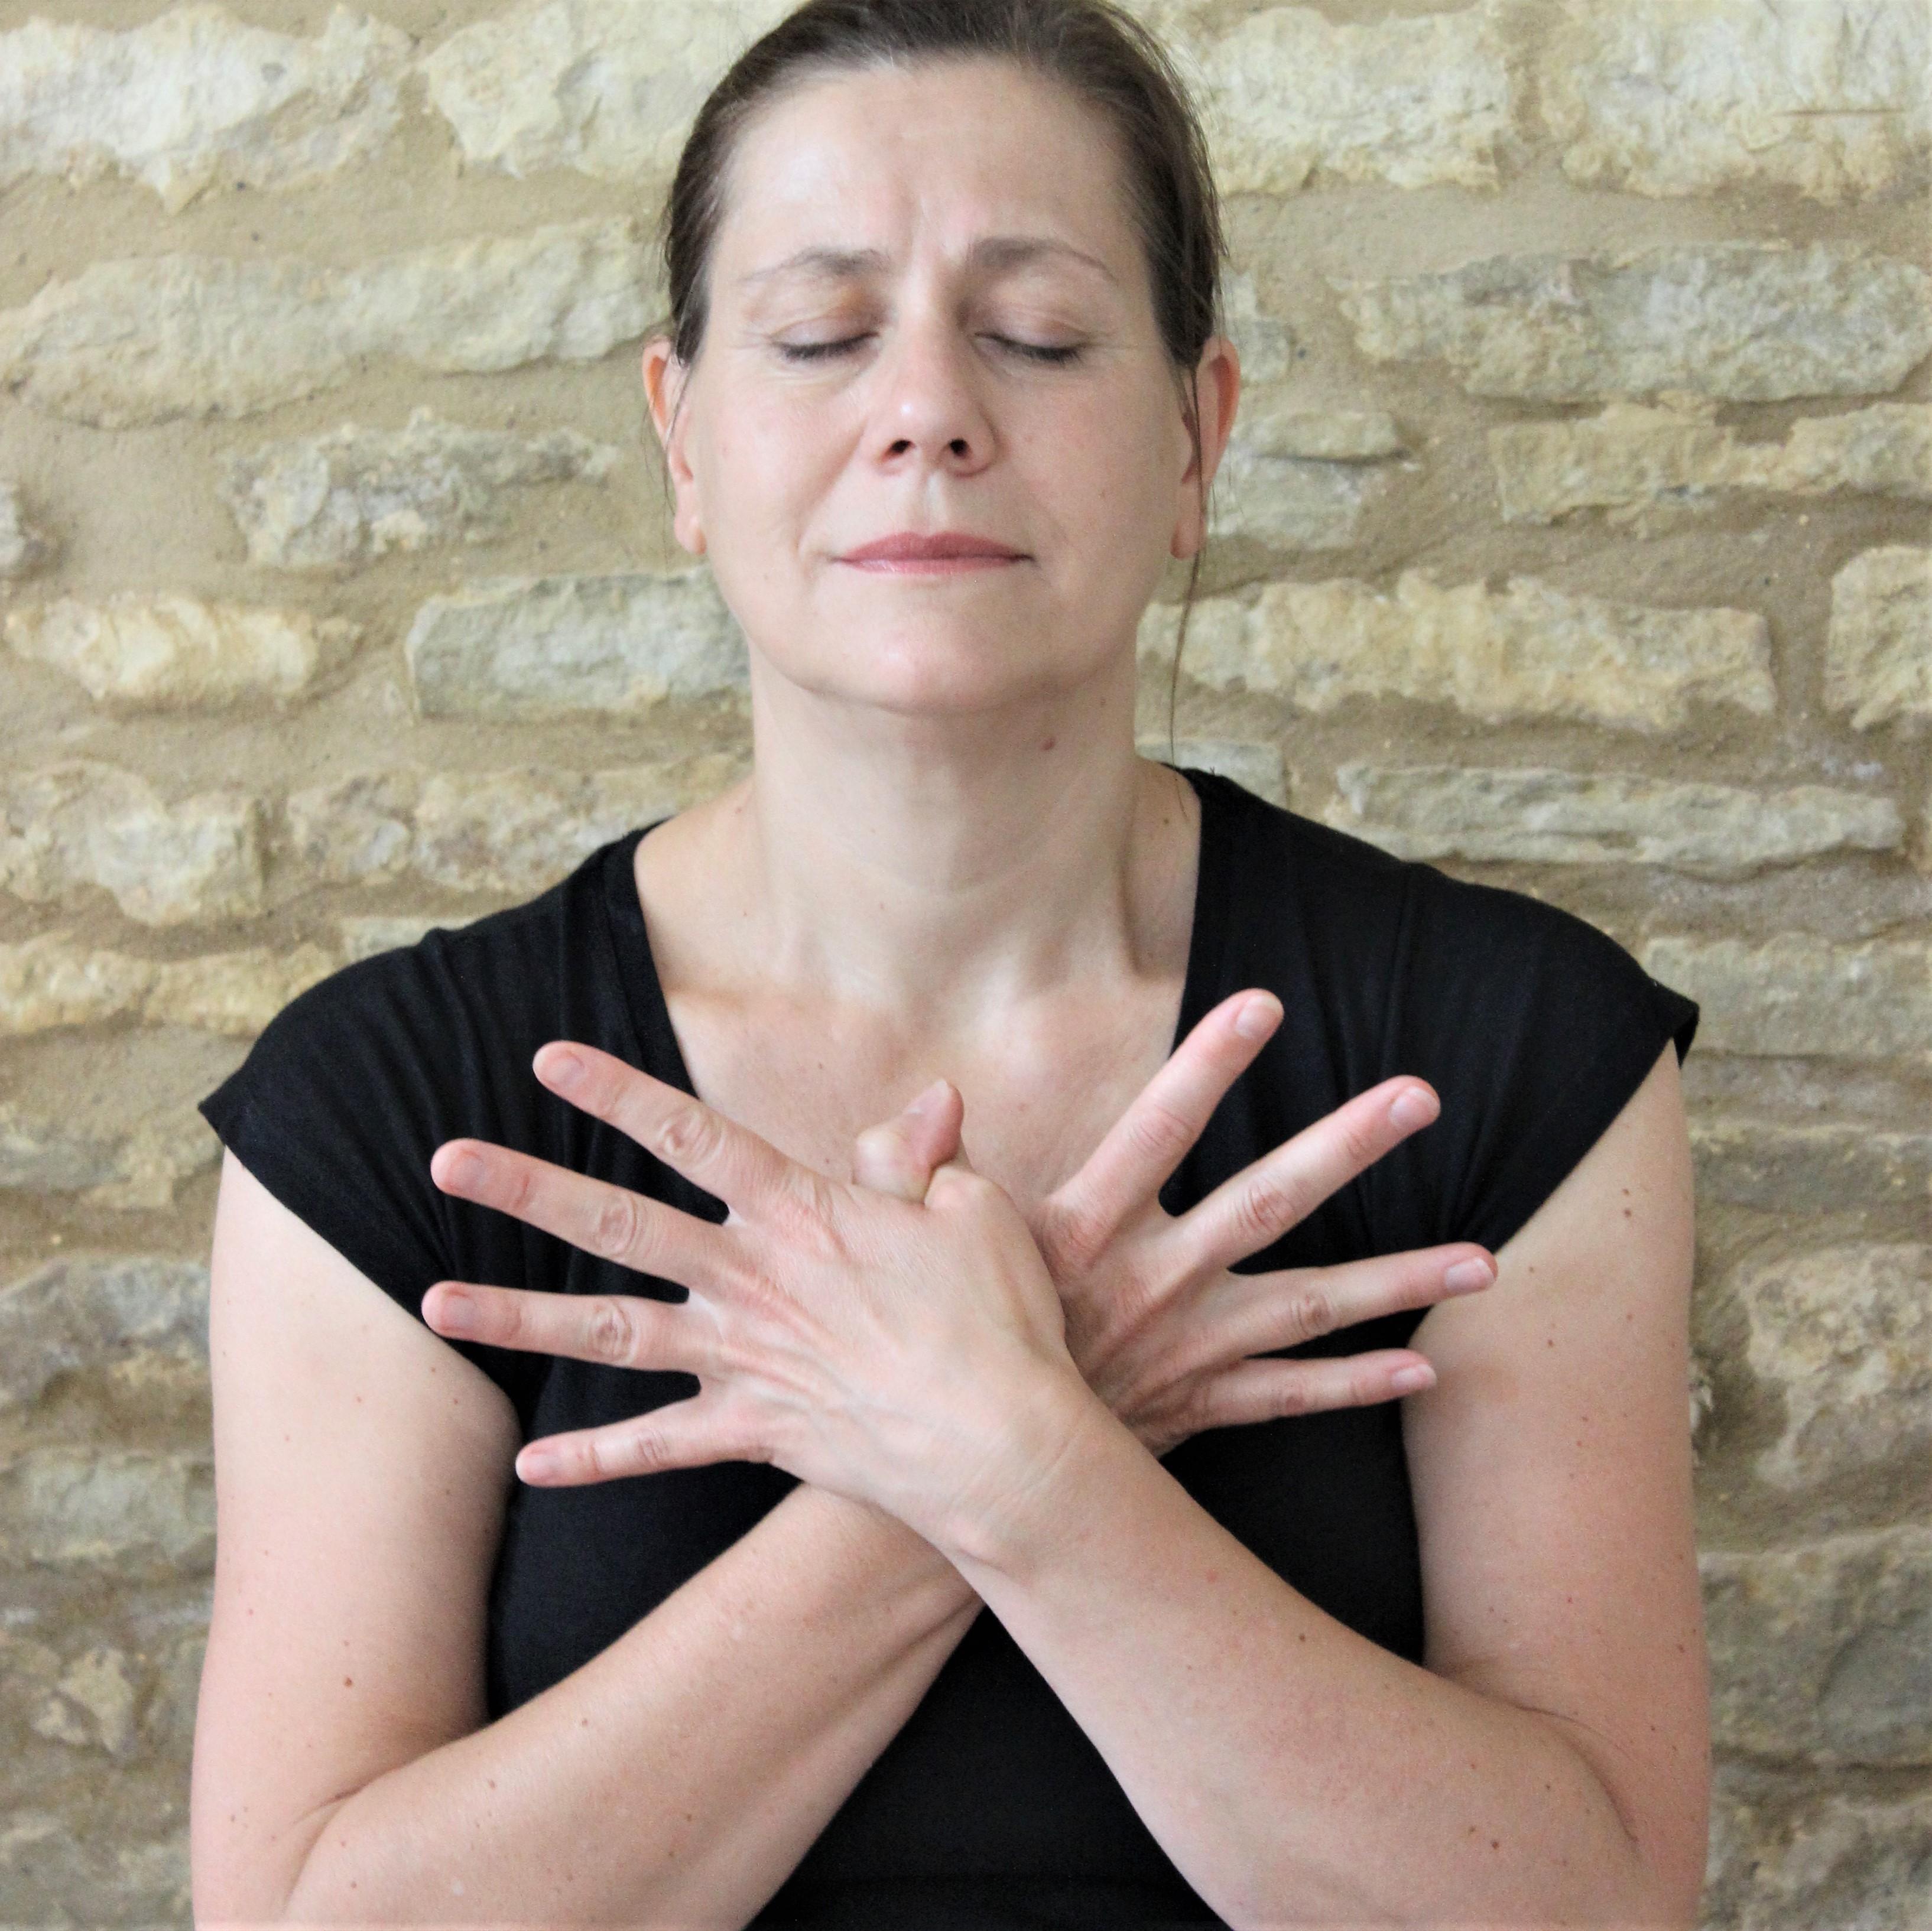 example yoga classes in stamford Yoga Teacher Deborah King meditating with Garuda mudra